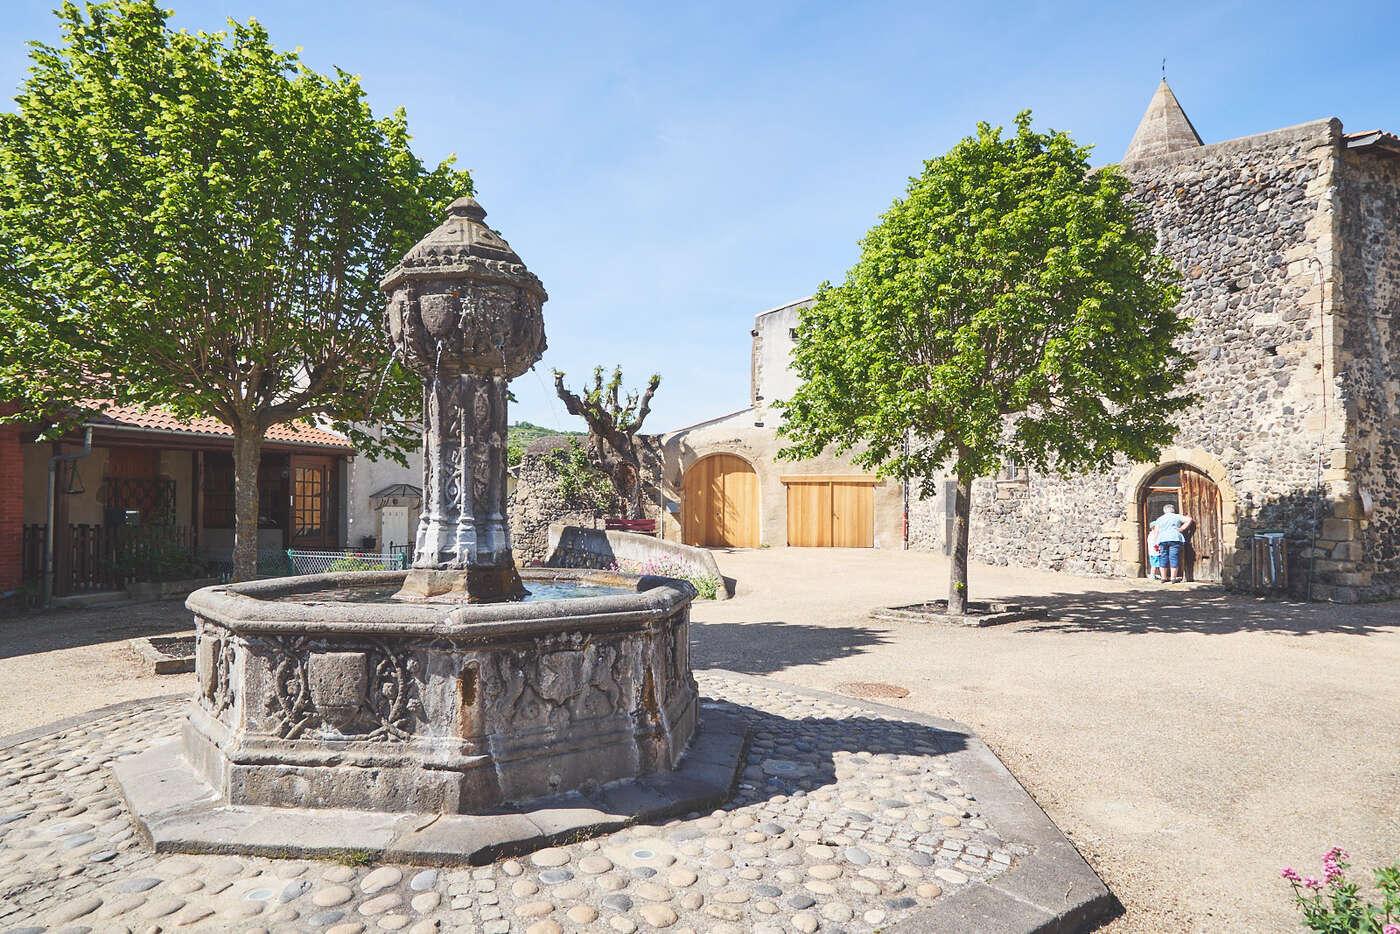 Place de l'Ormeau, Saint-Saturnin